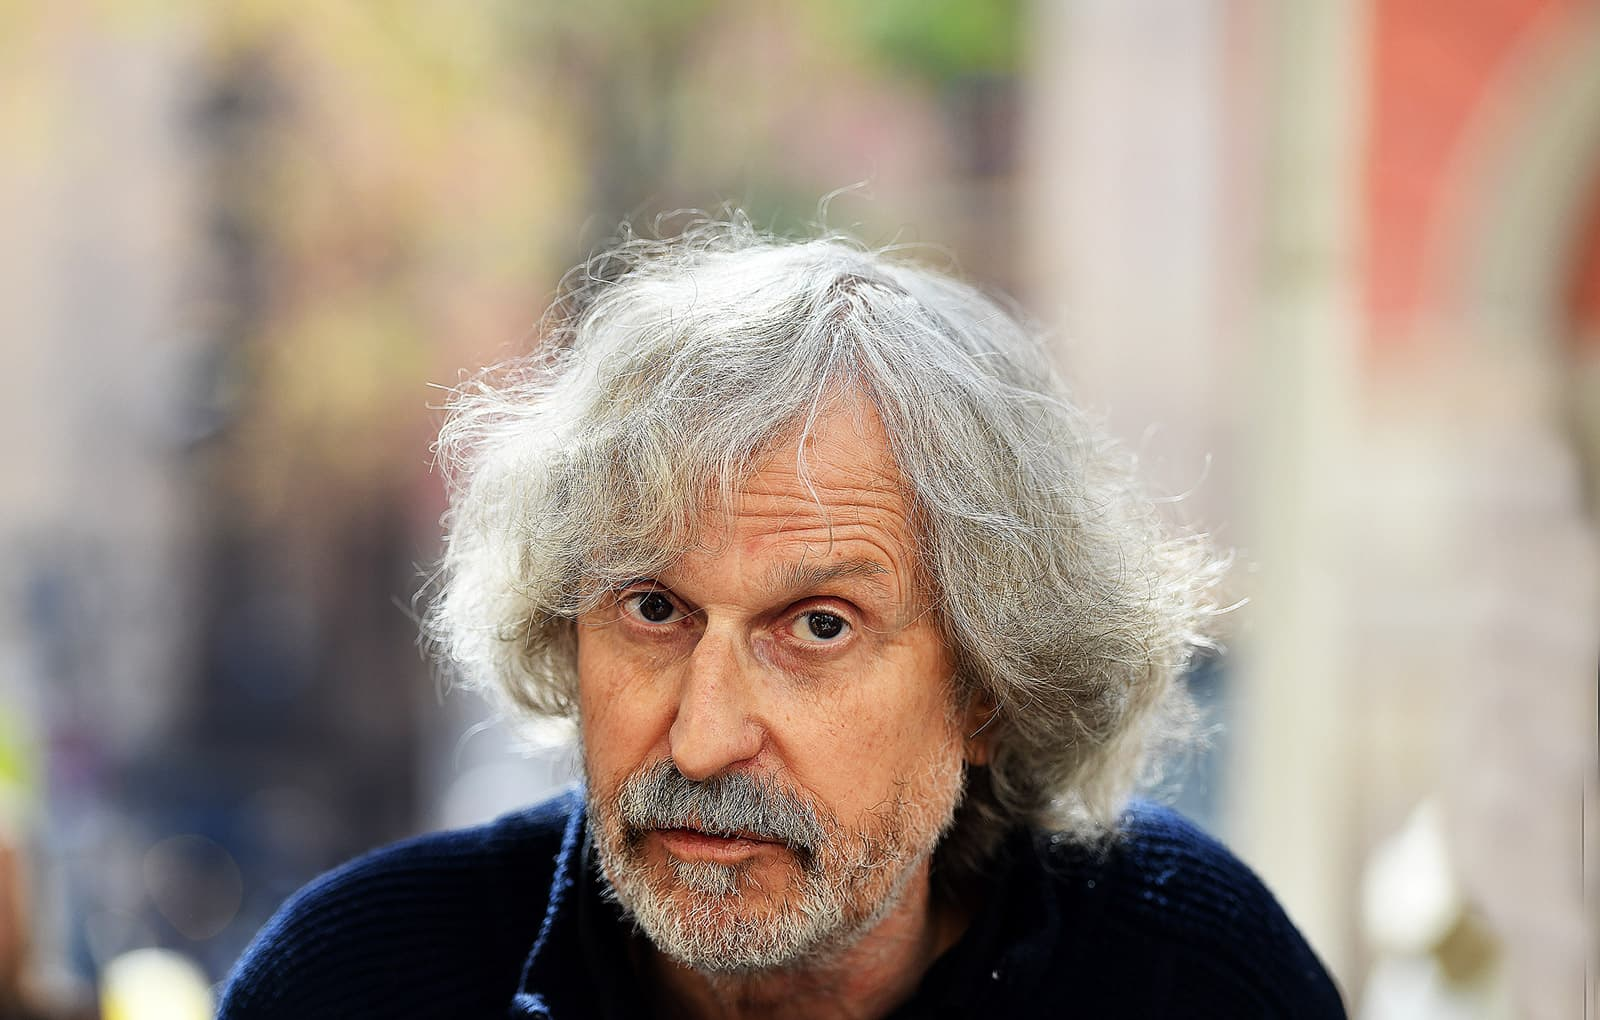 Josep Maria Fradera a la plaça de la Vila de Gràcia, el 22 de març. Fotografia de Xavier Jubierre.